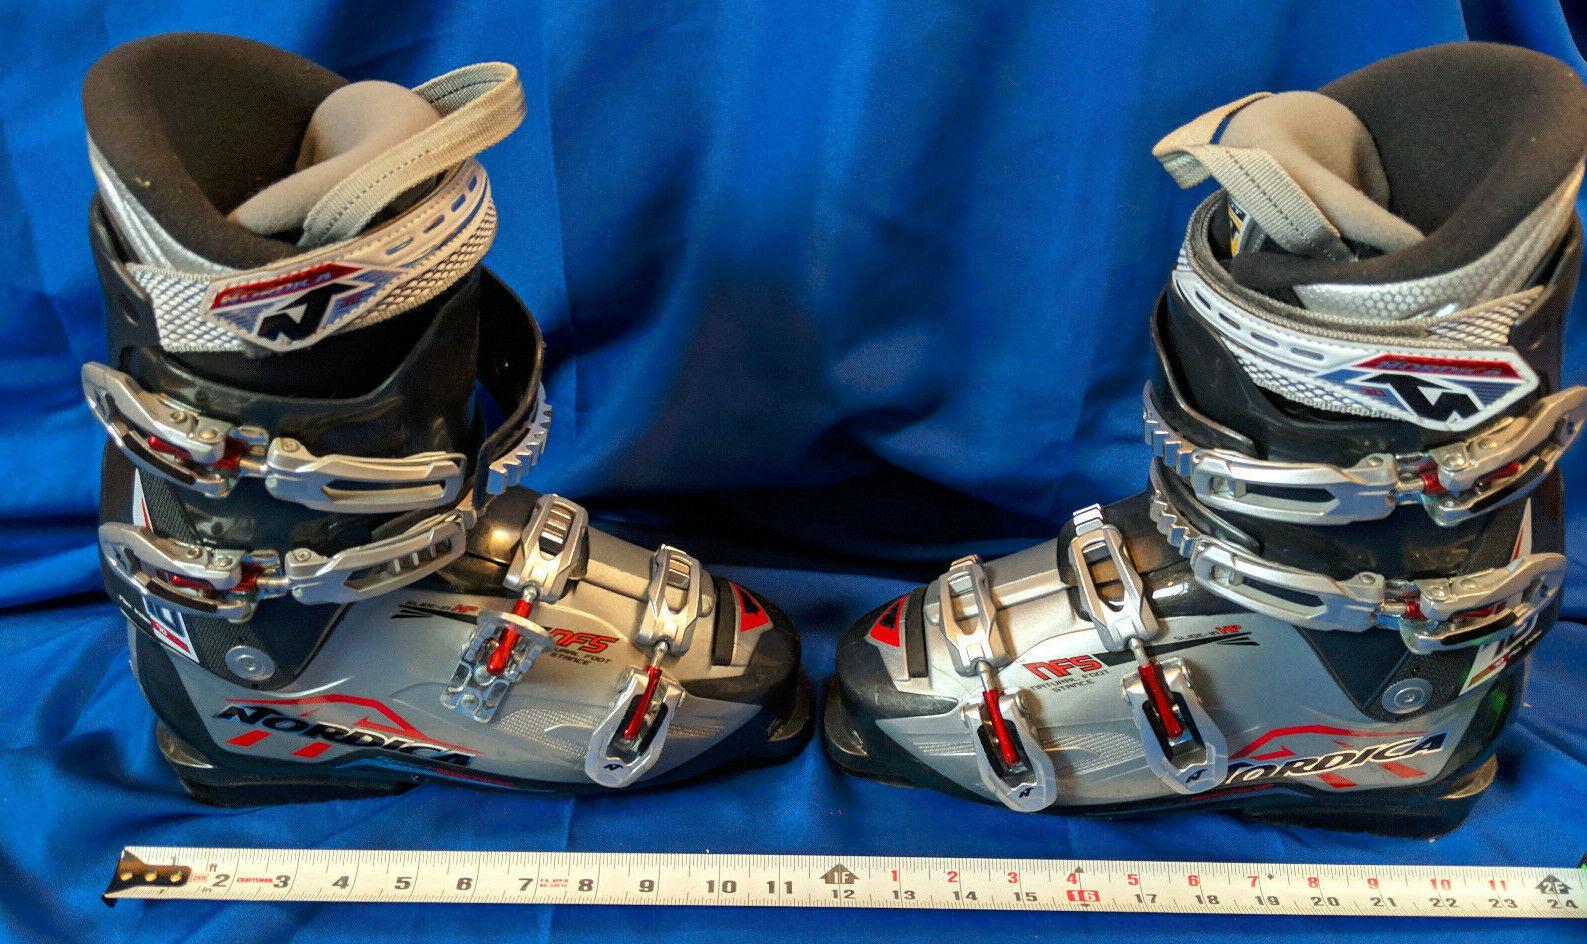 Nordica Flex Index 70 NFS 305mm Ski Boots Comfort FIt 26.5 Pro Nice